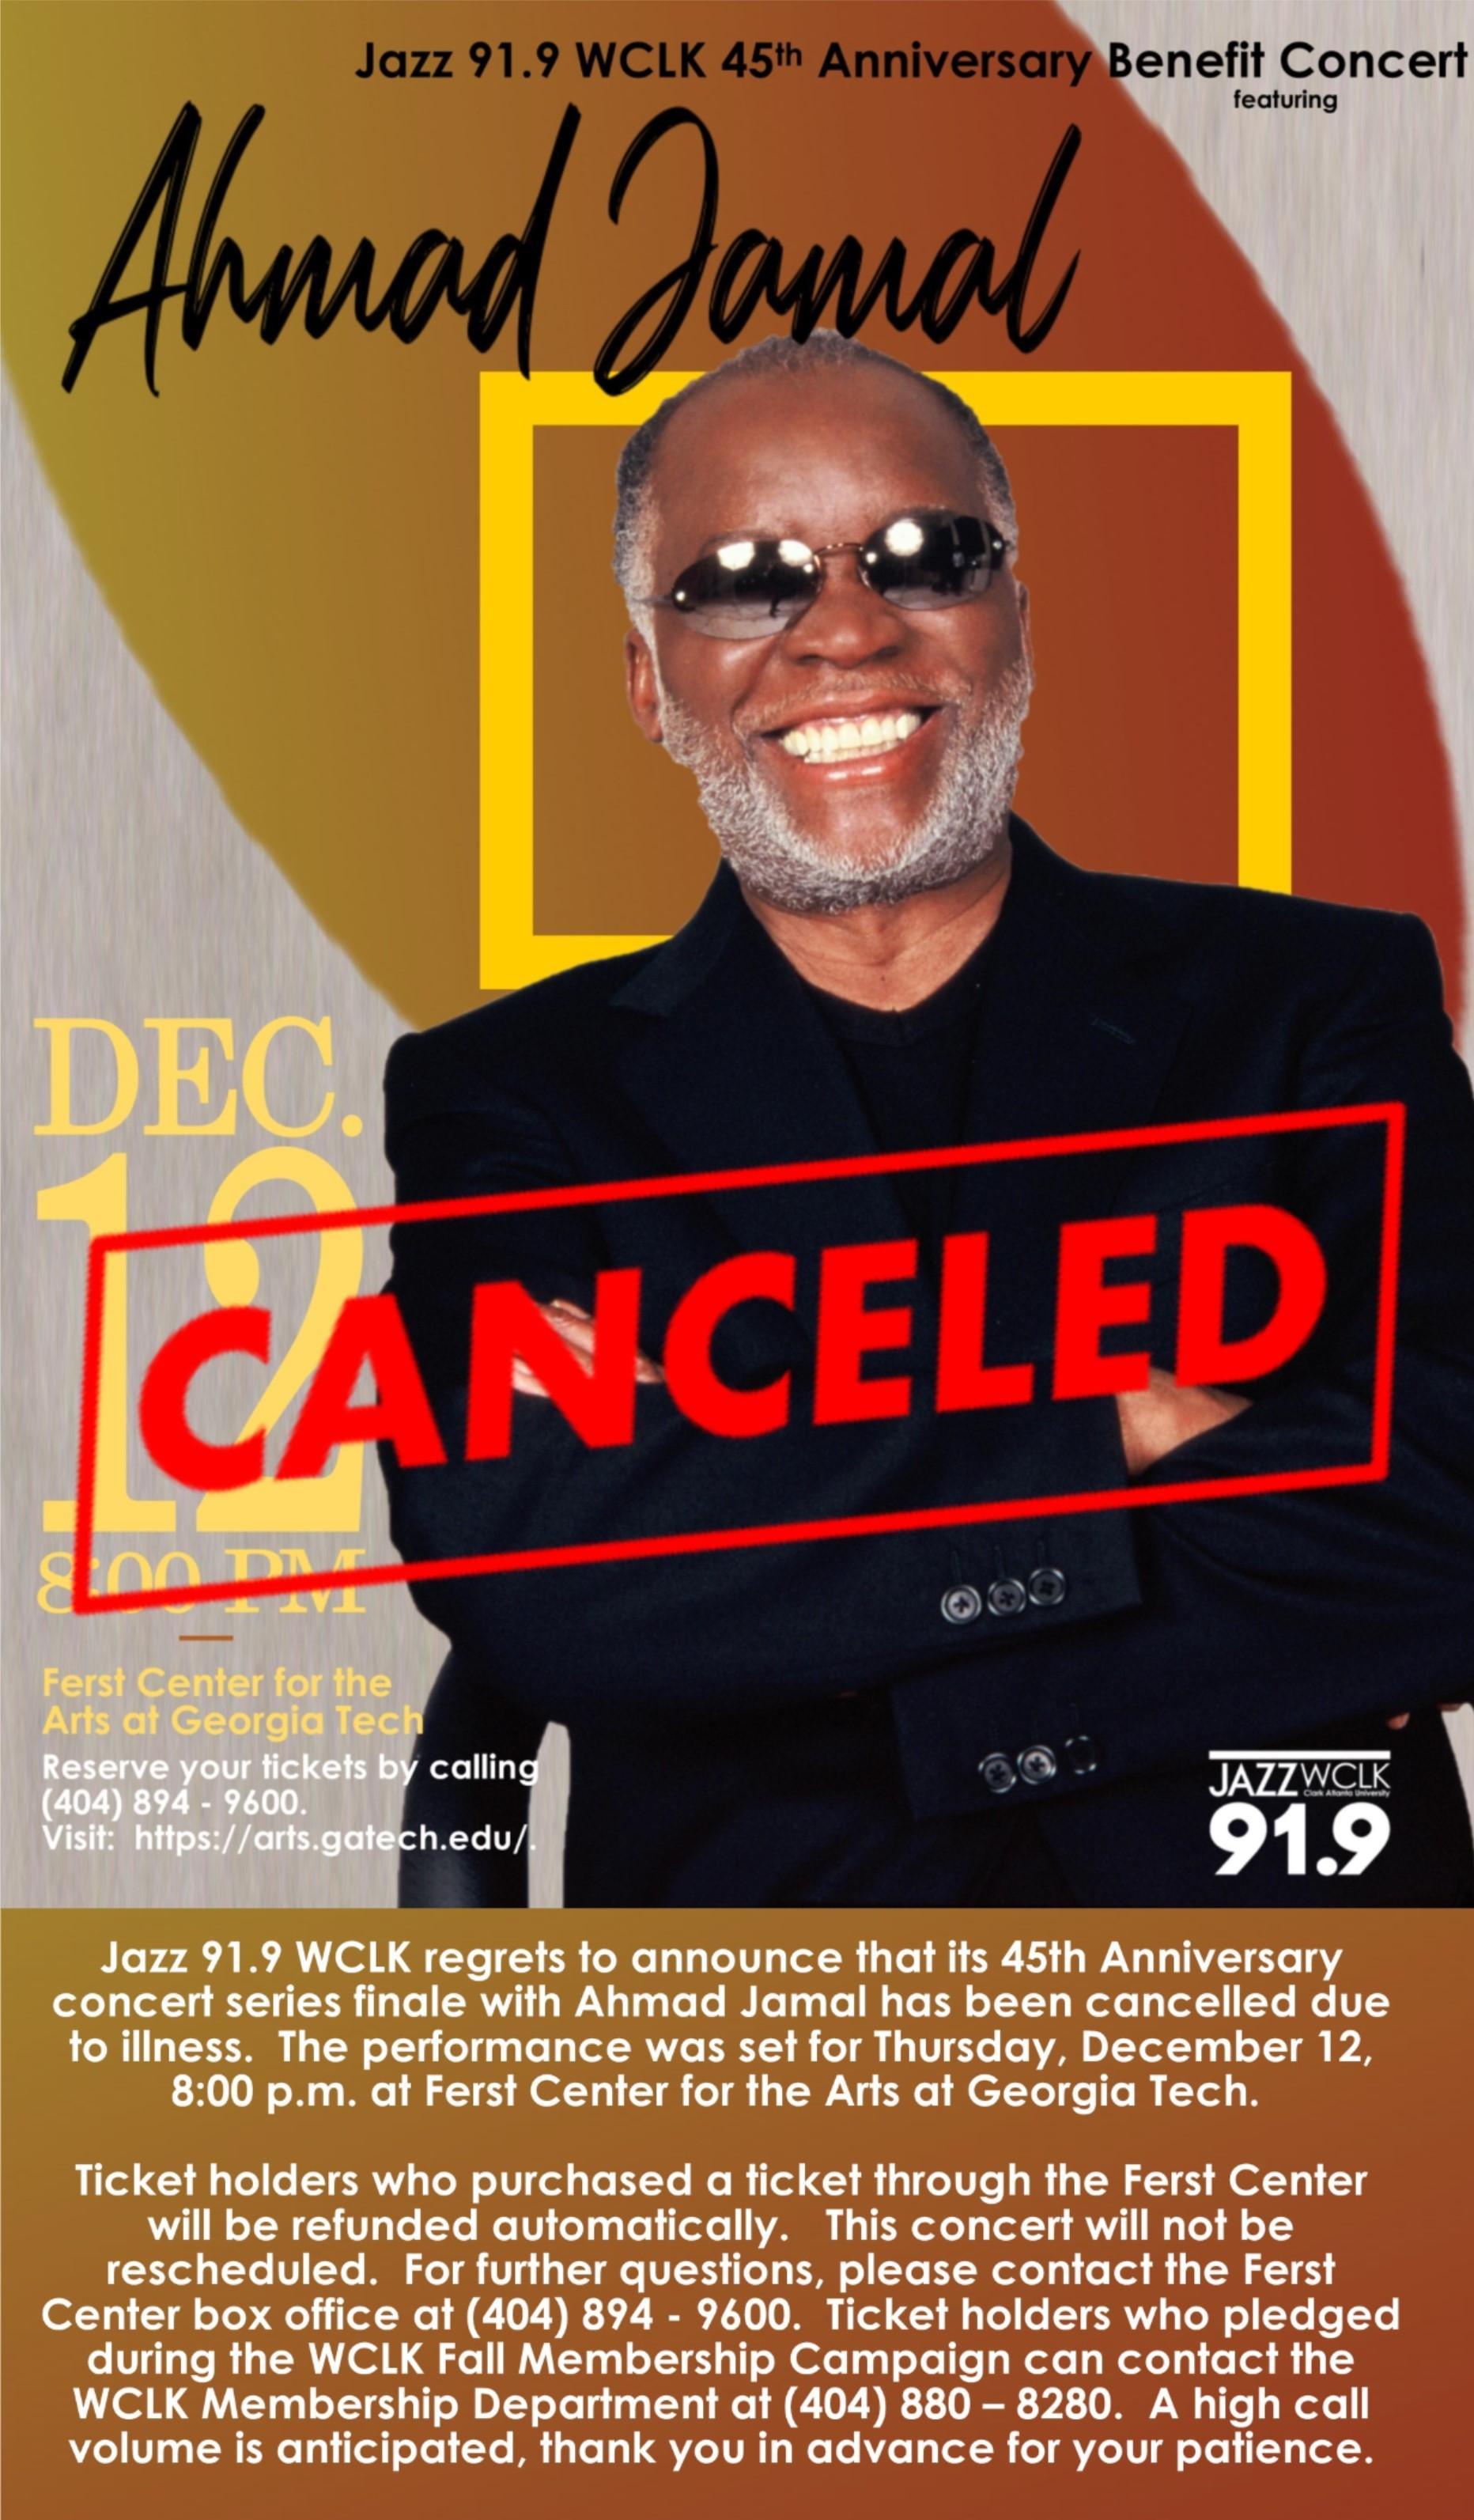 Ahmad Jamal December 12 Performance Cancelled | WCLK